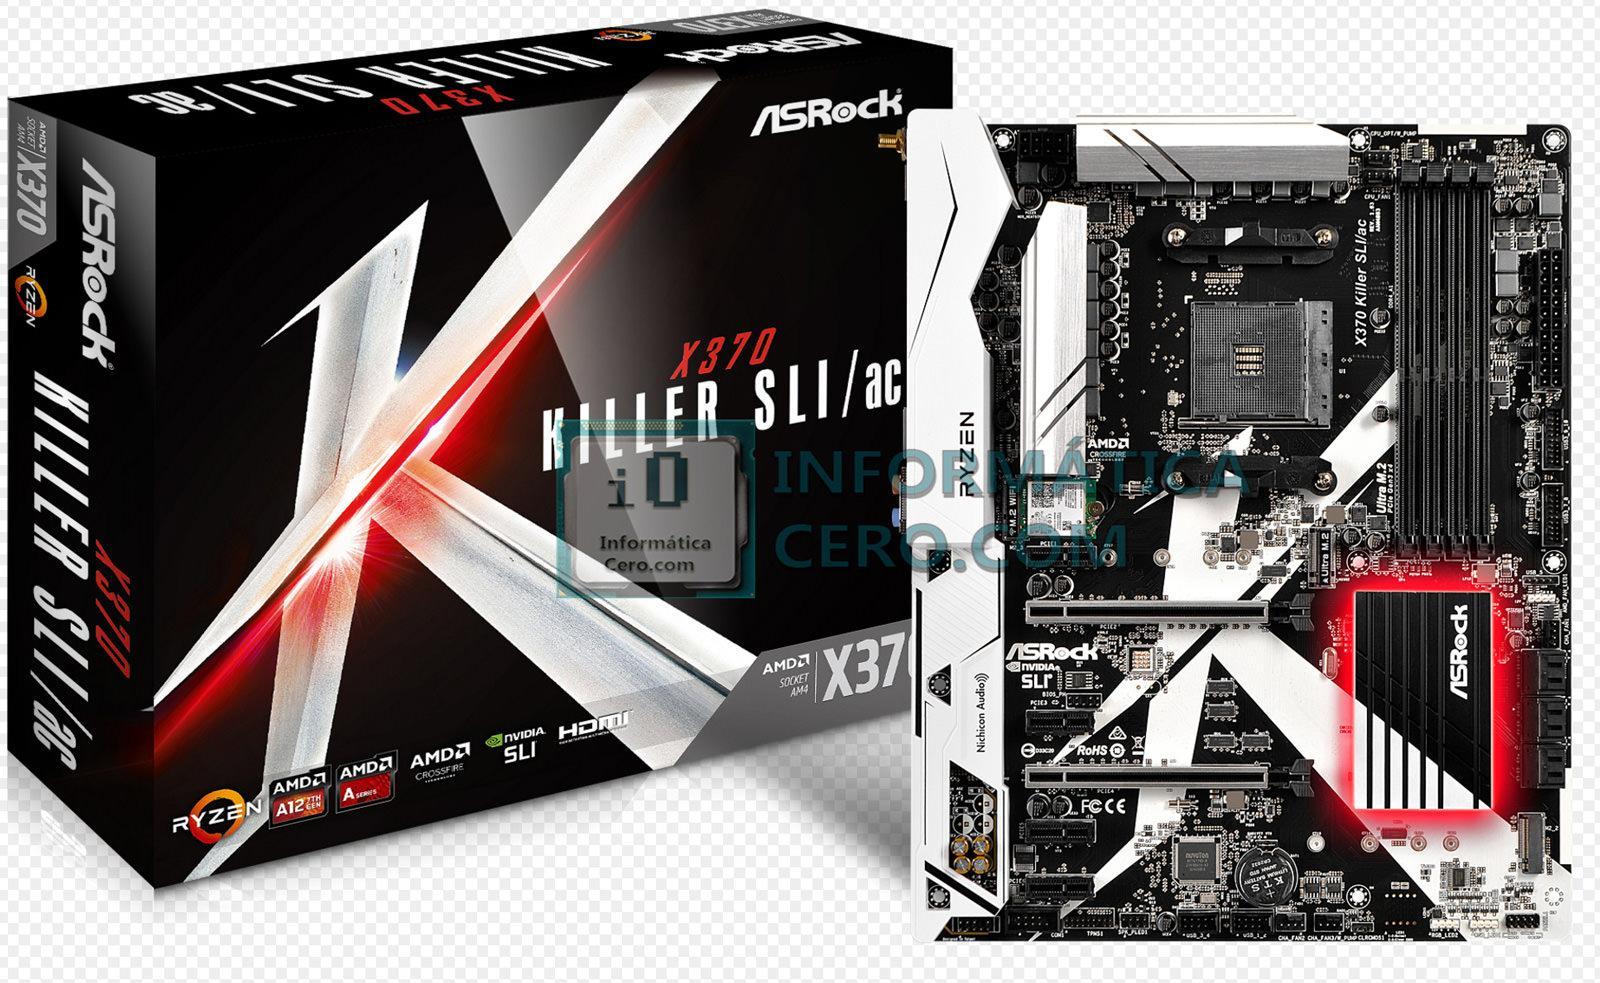 ASRock X370 Killer SLIac